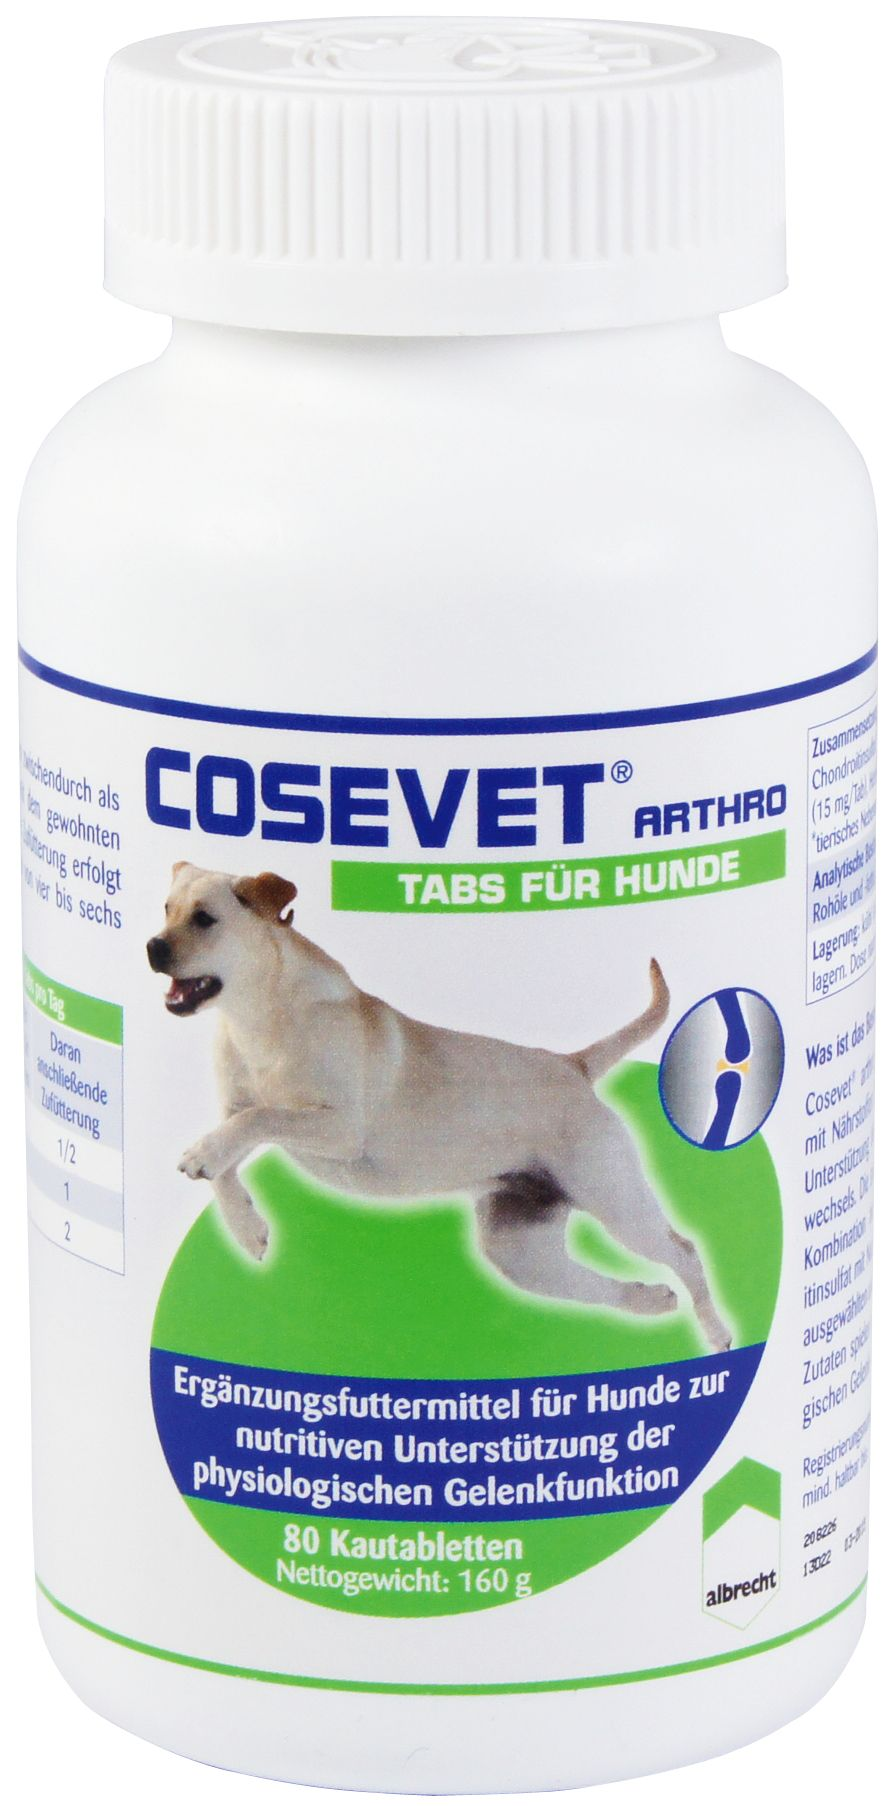 Cosevet arthro Tabs